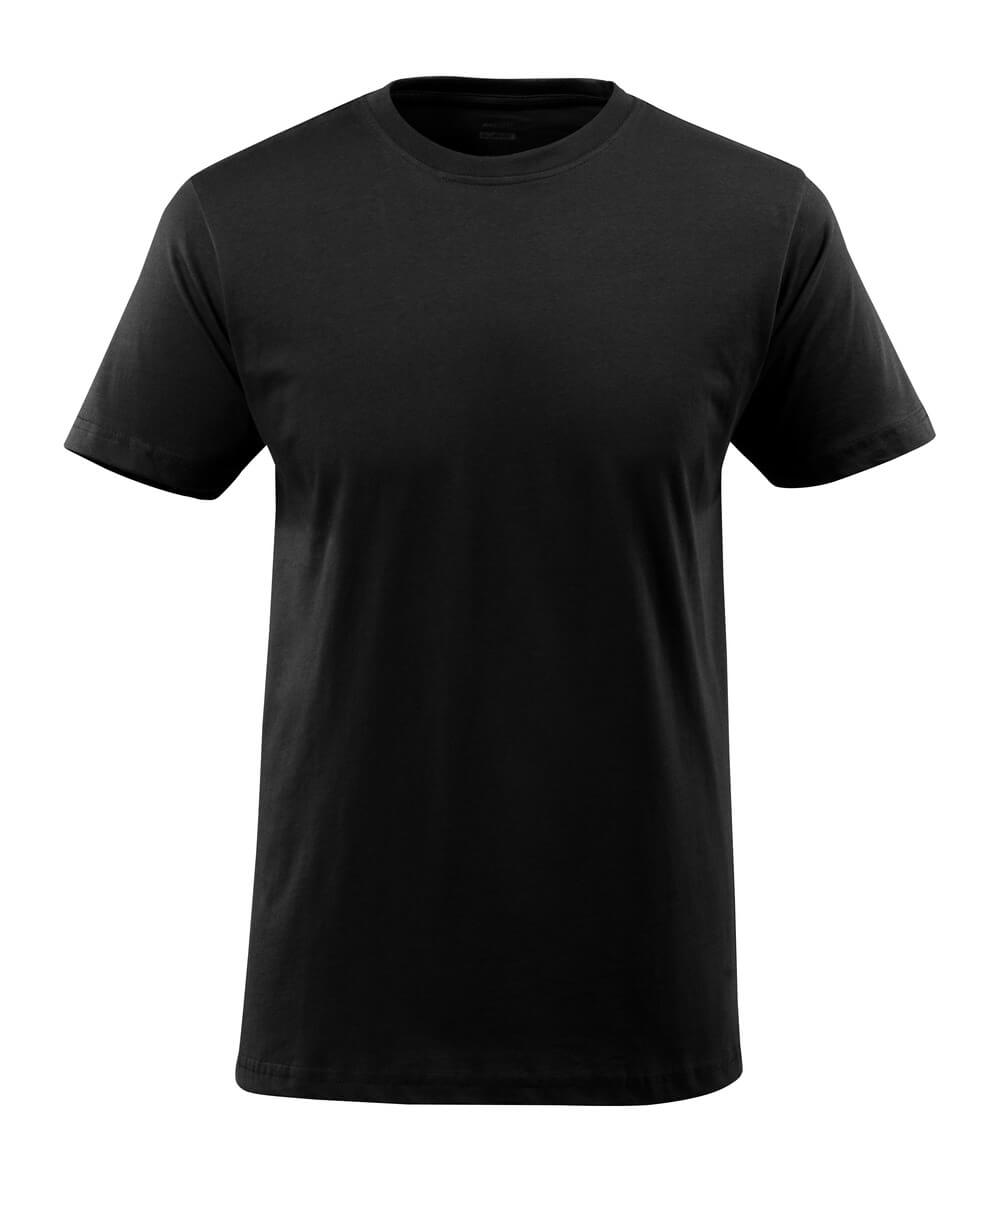 51579-965-90 T-skjorte - Dyp svart